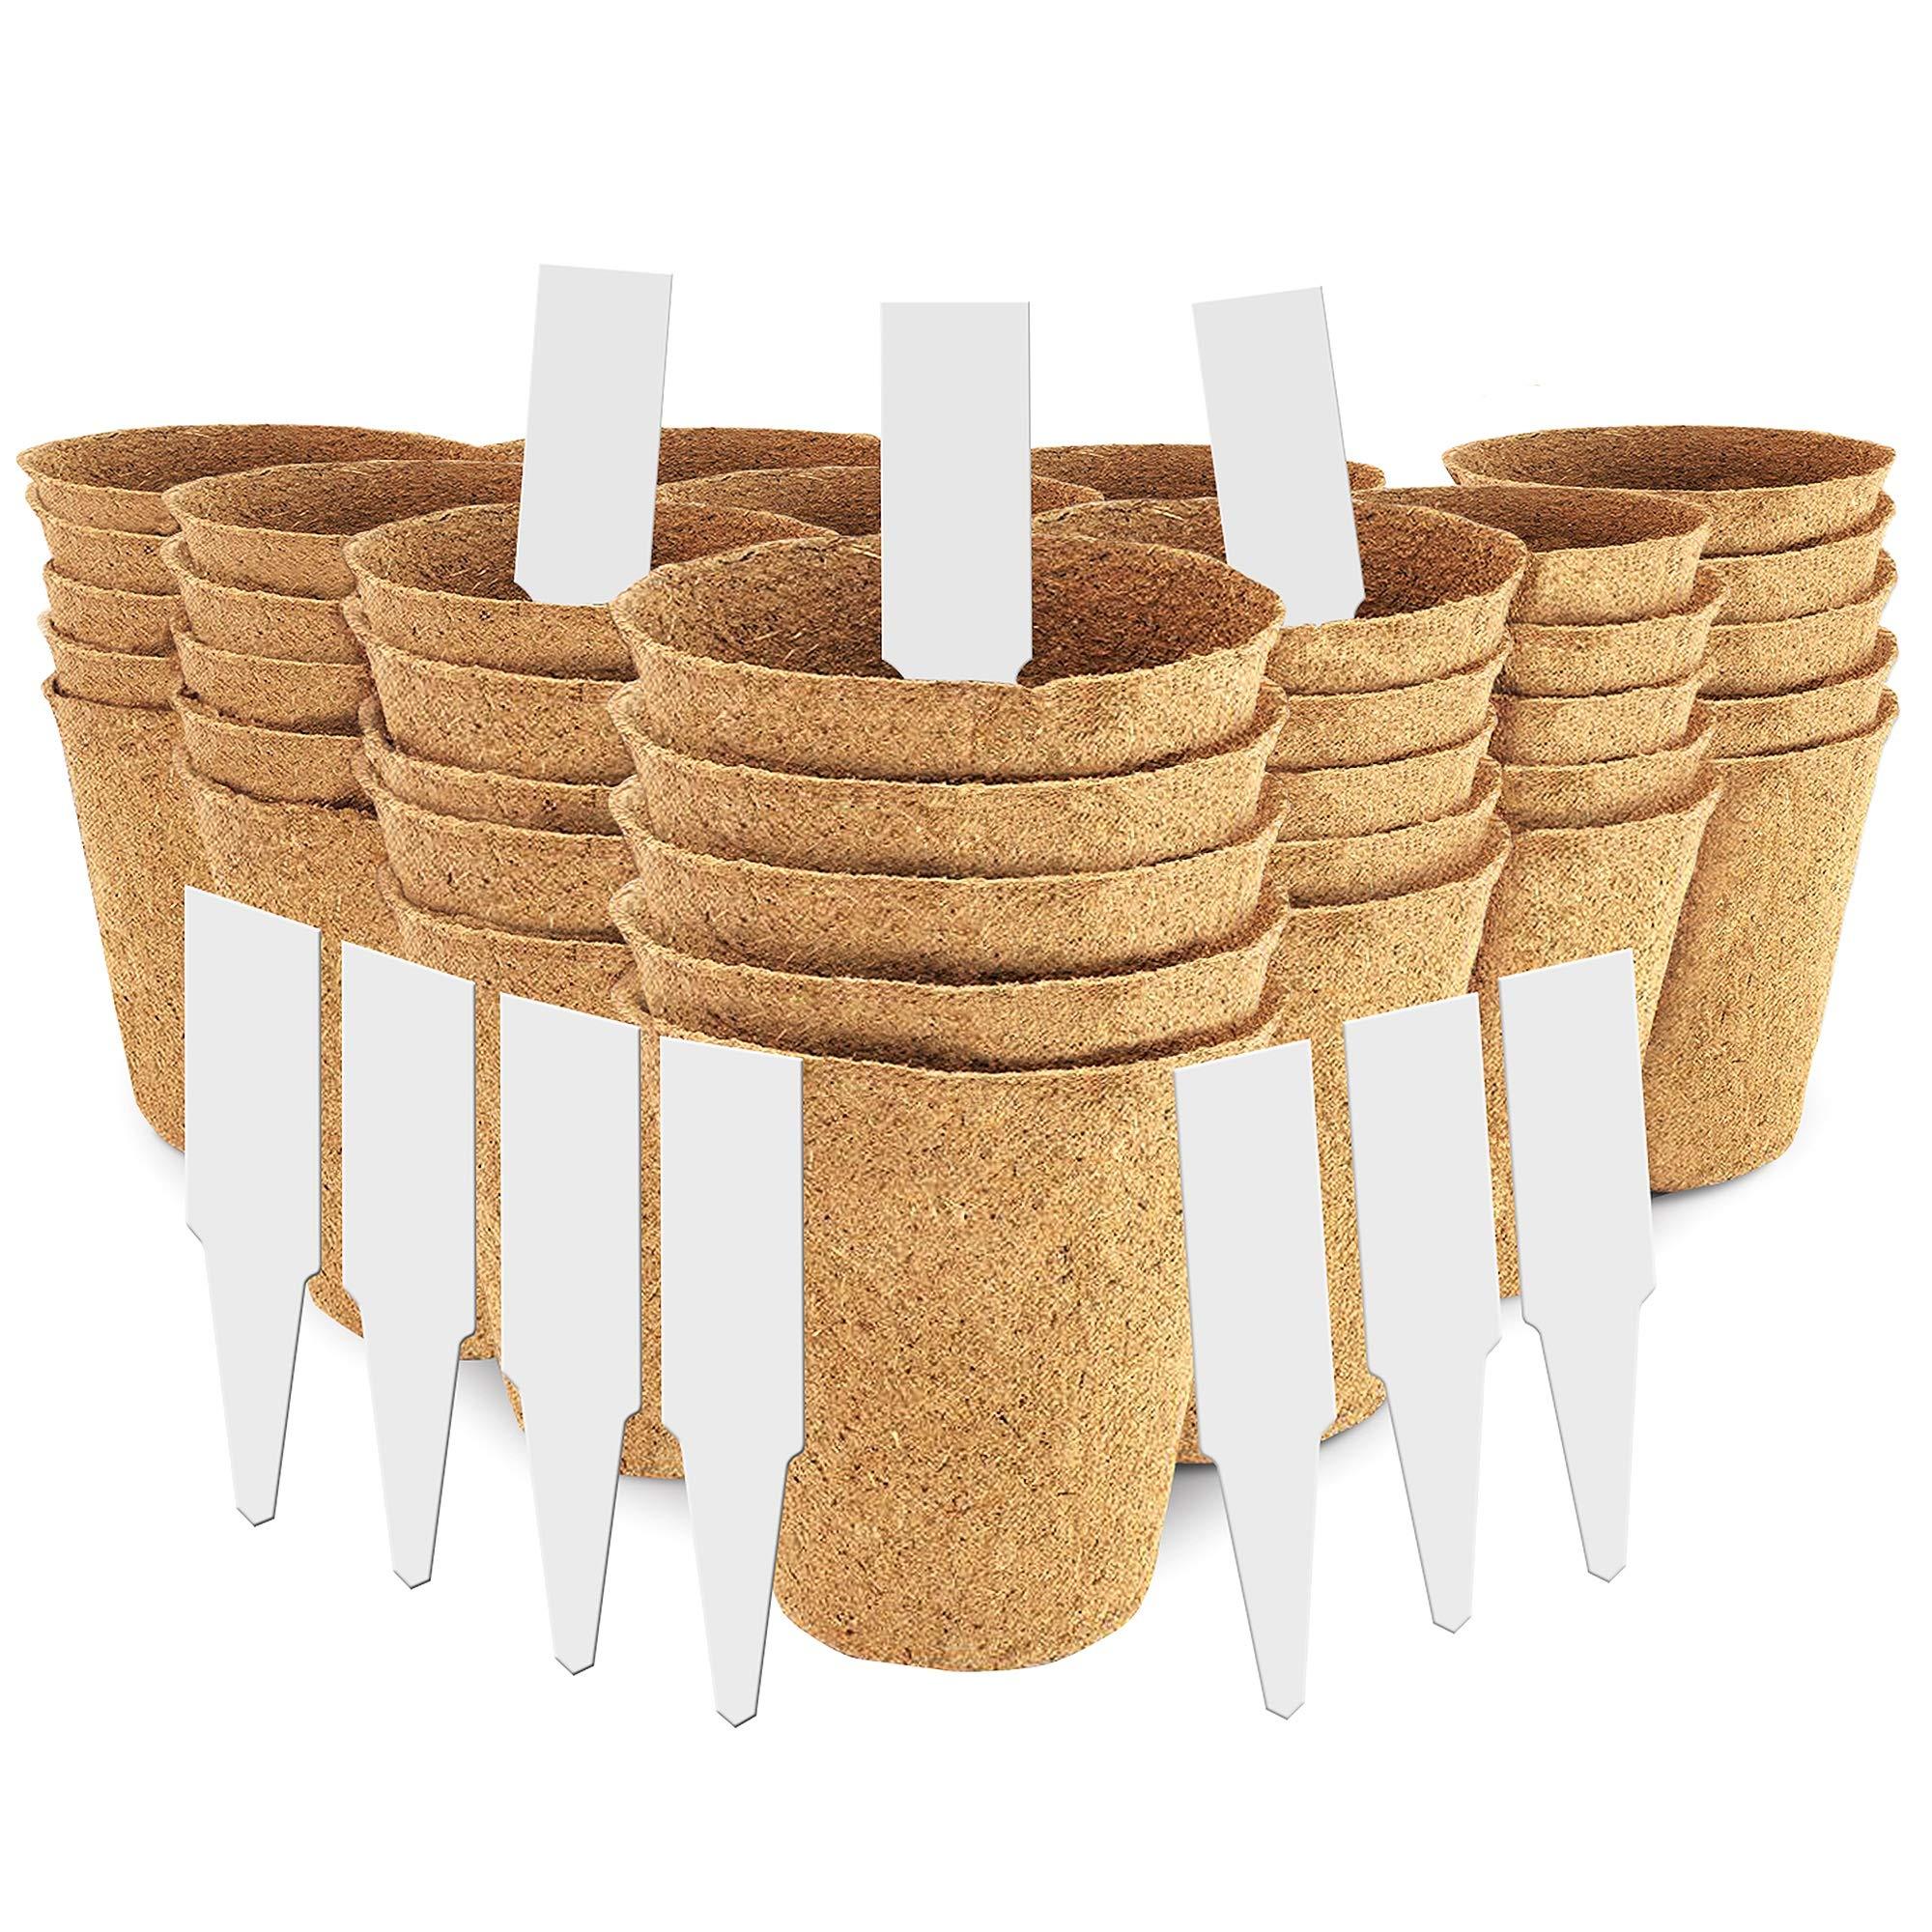 3'' Peat Pots   Plant Starters   Seedling & Herb Seed Starter Kit - Organic Biodegradable Pots 100% Eco-Friendly Enhance Aeration   BONUS 10 Plastic Plant Markers - Bulk 60 Pack, 3 inch by Daniel's Plants